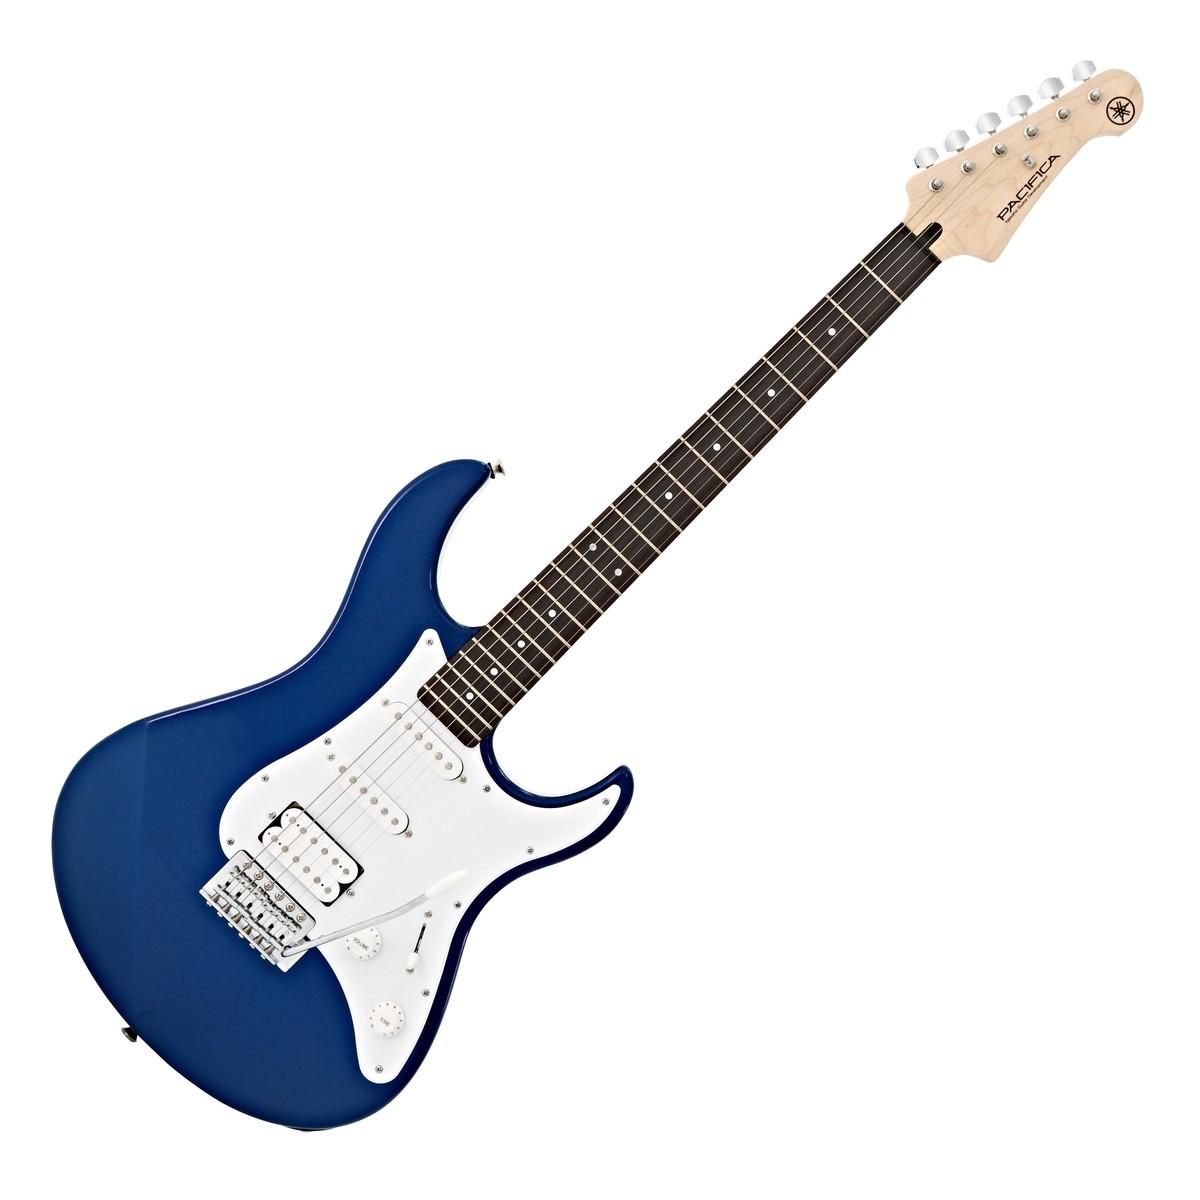 Yamaha Pacifica 012, Metallic Blue on